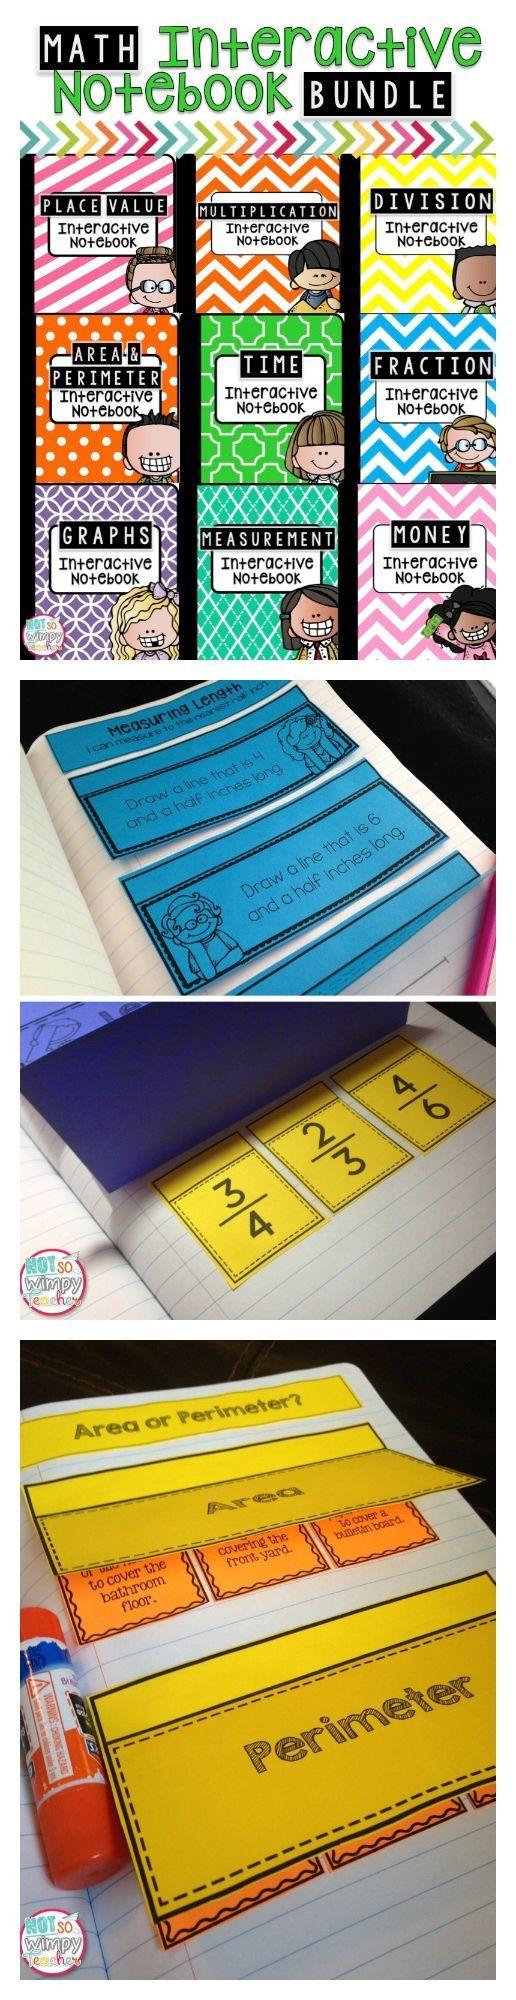 28 best math stations images on Pinterest | Workshop, Math centers ...